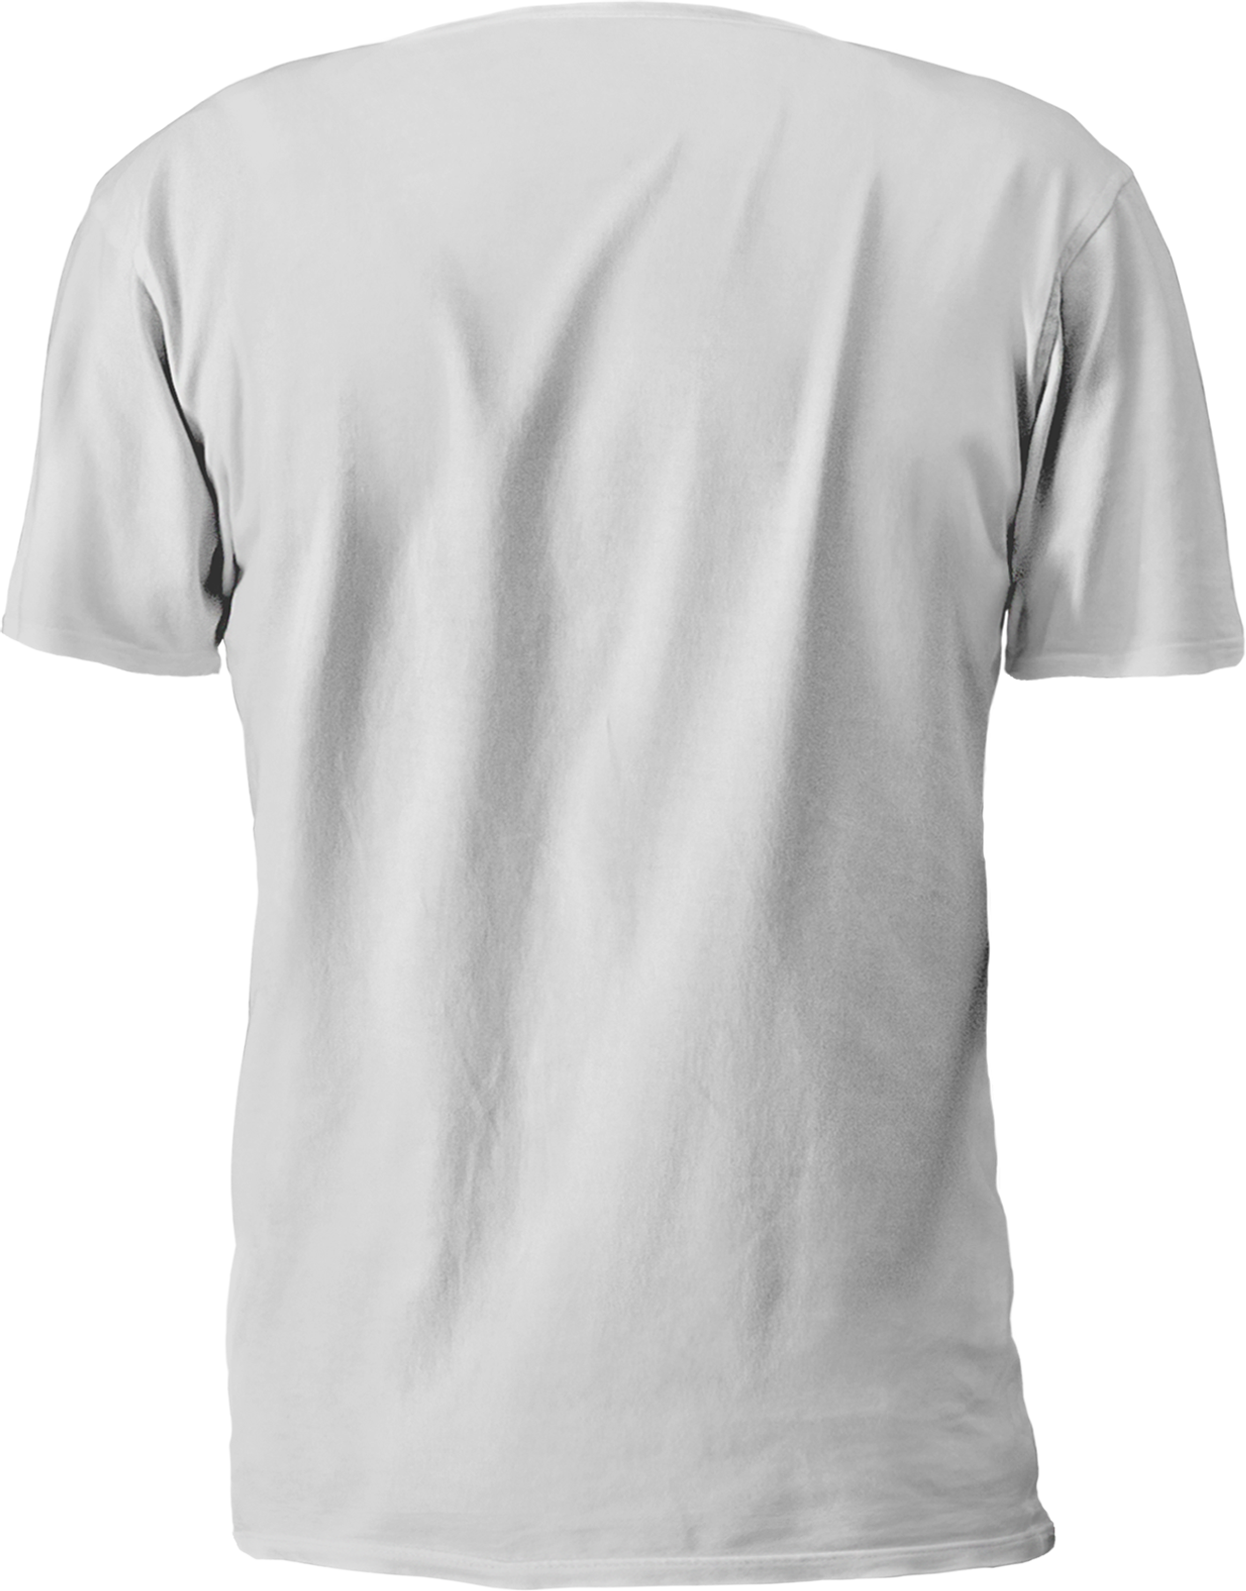 t shirt with flex print tshirt printing. Black Bedroom Furniture Sets. Home Design Ideas